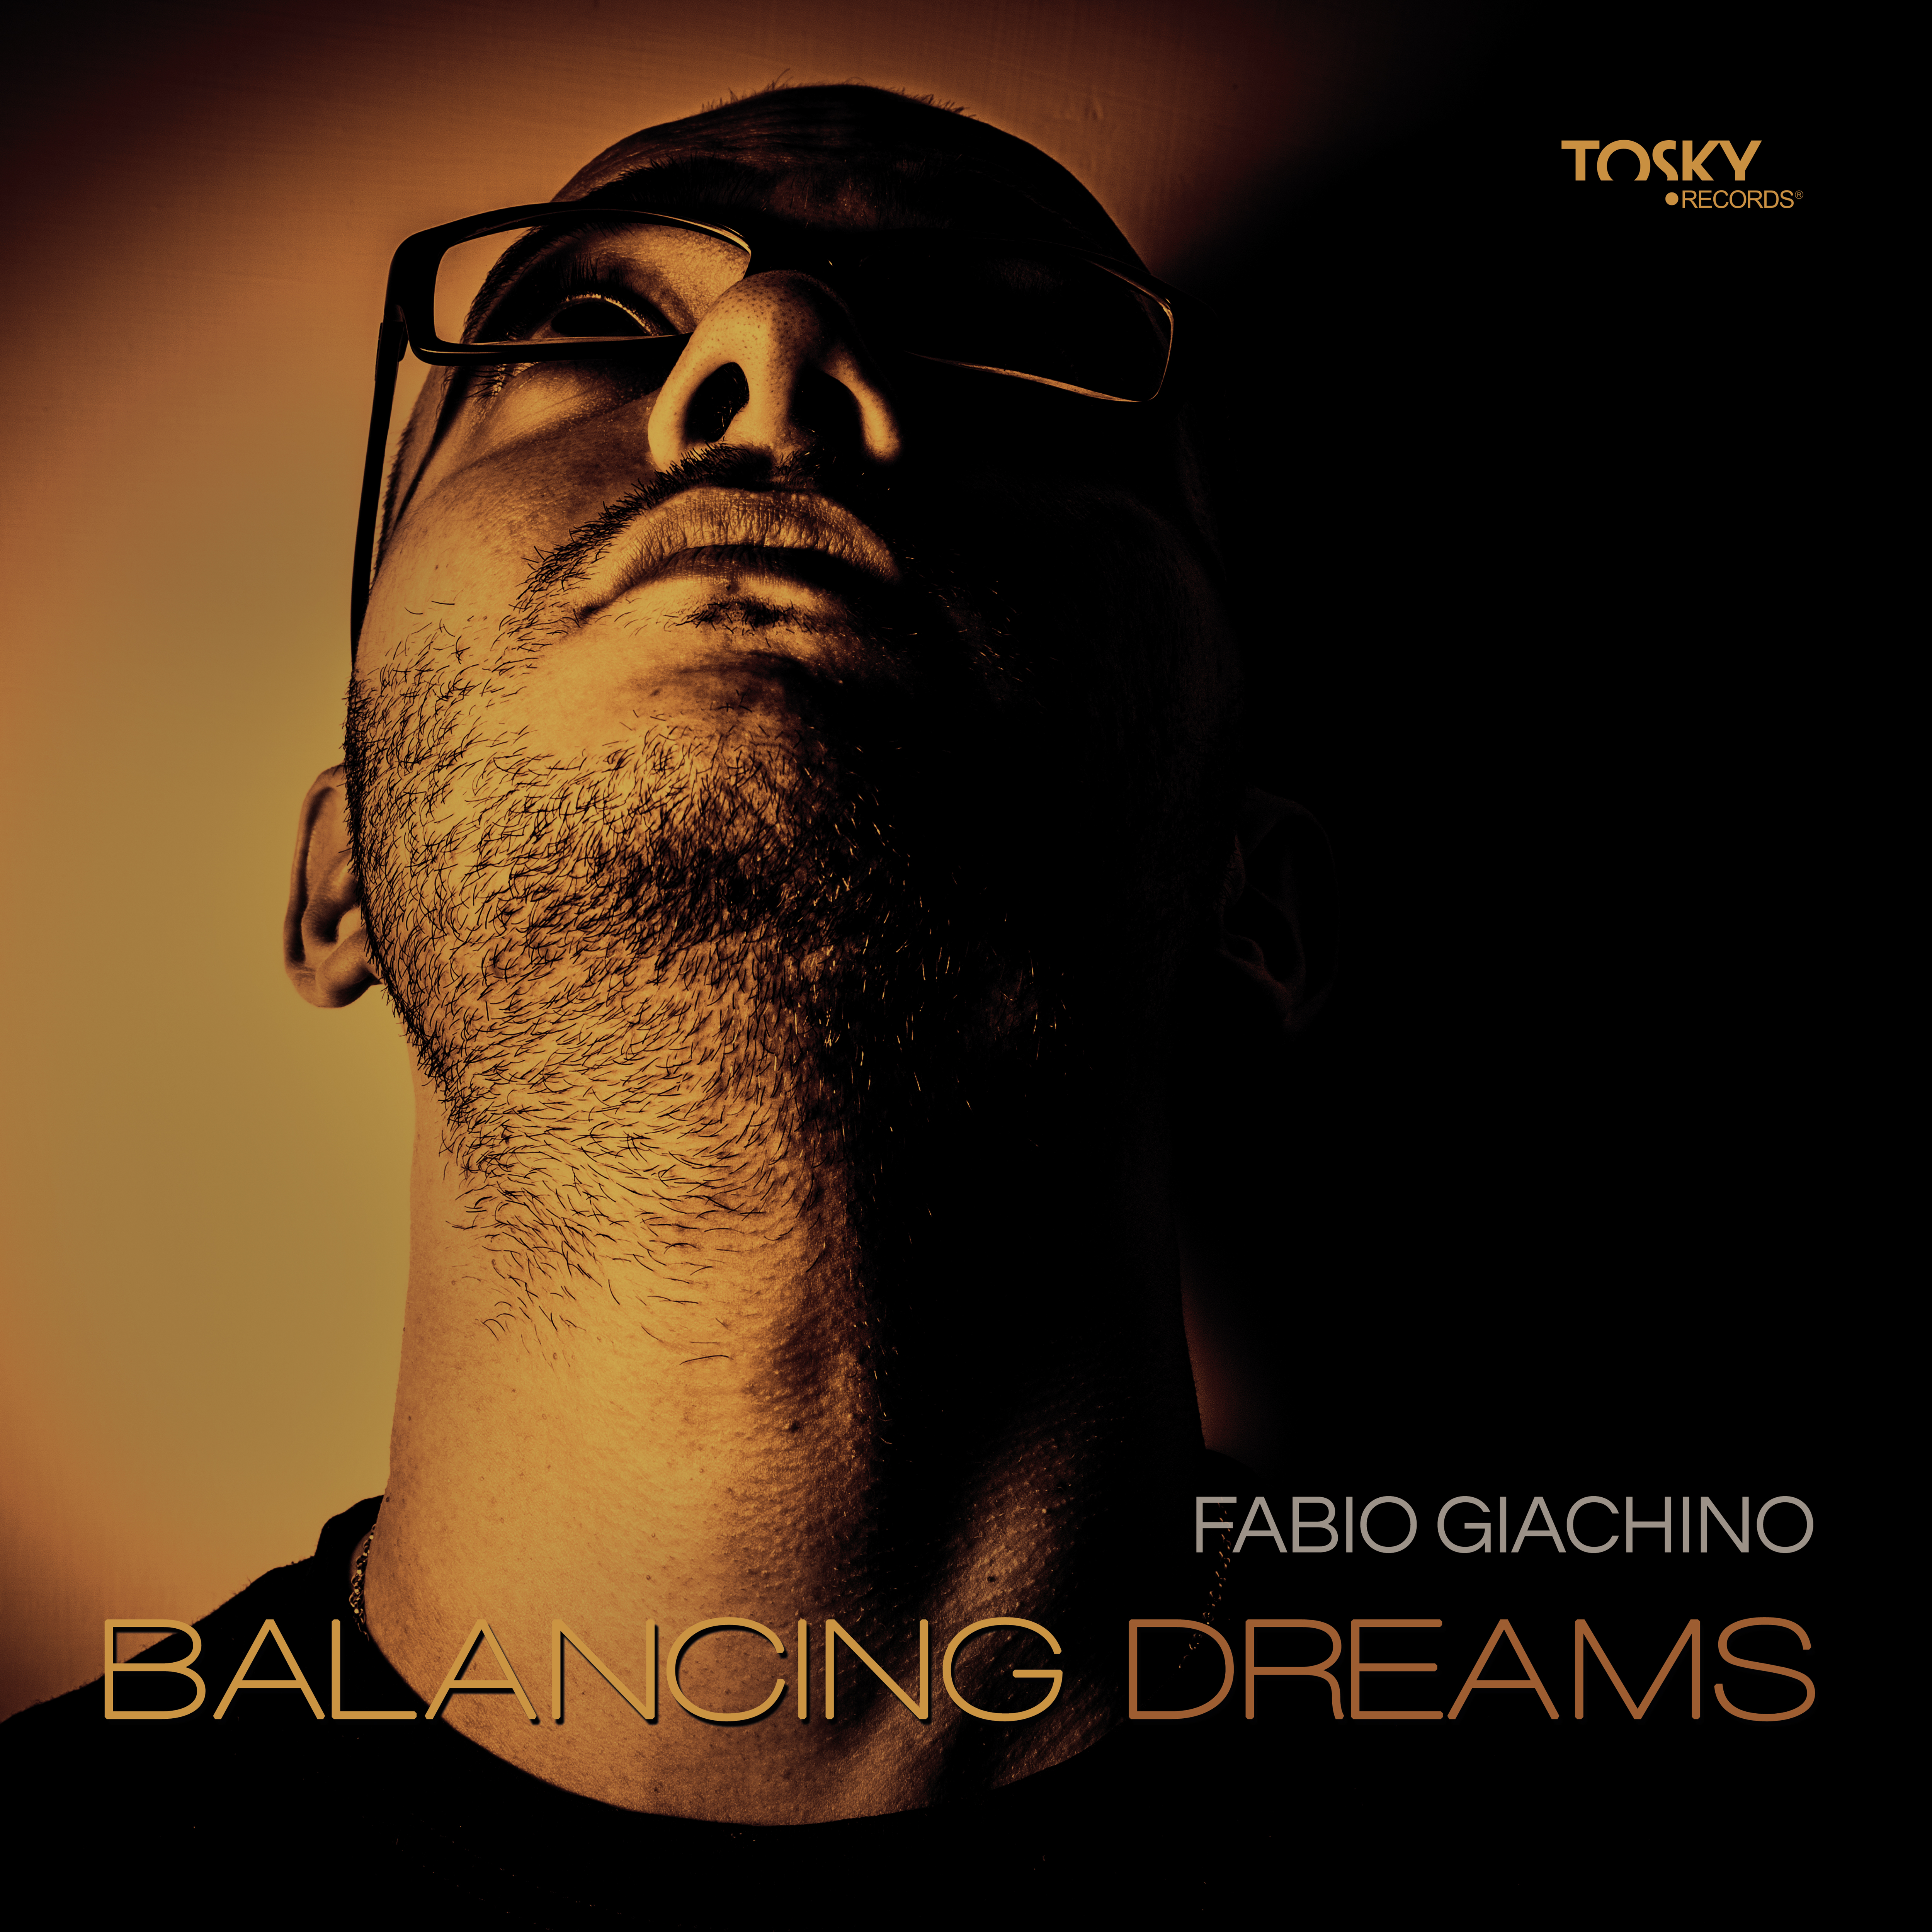 Balancing Dreams